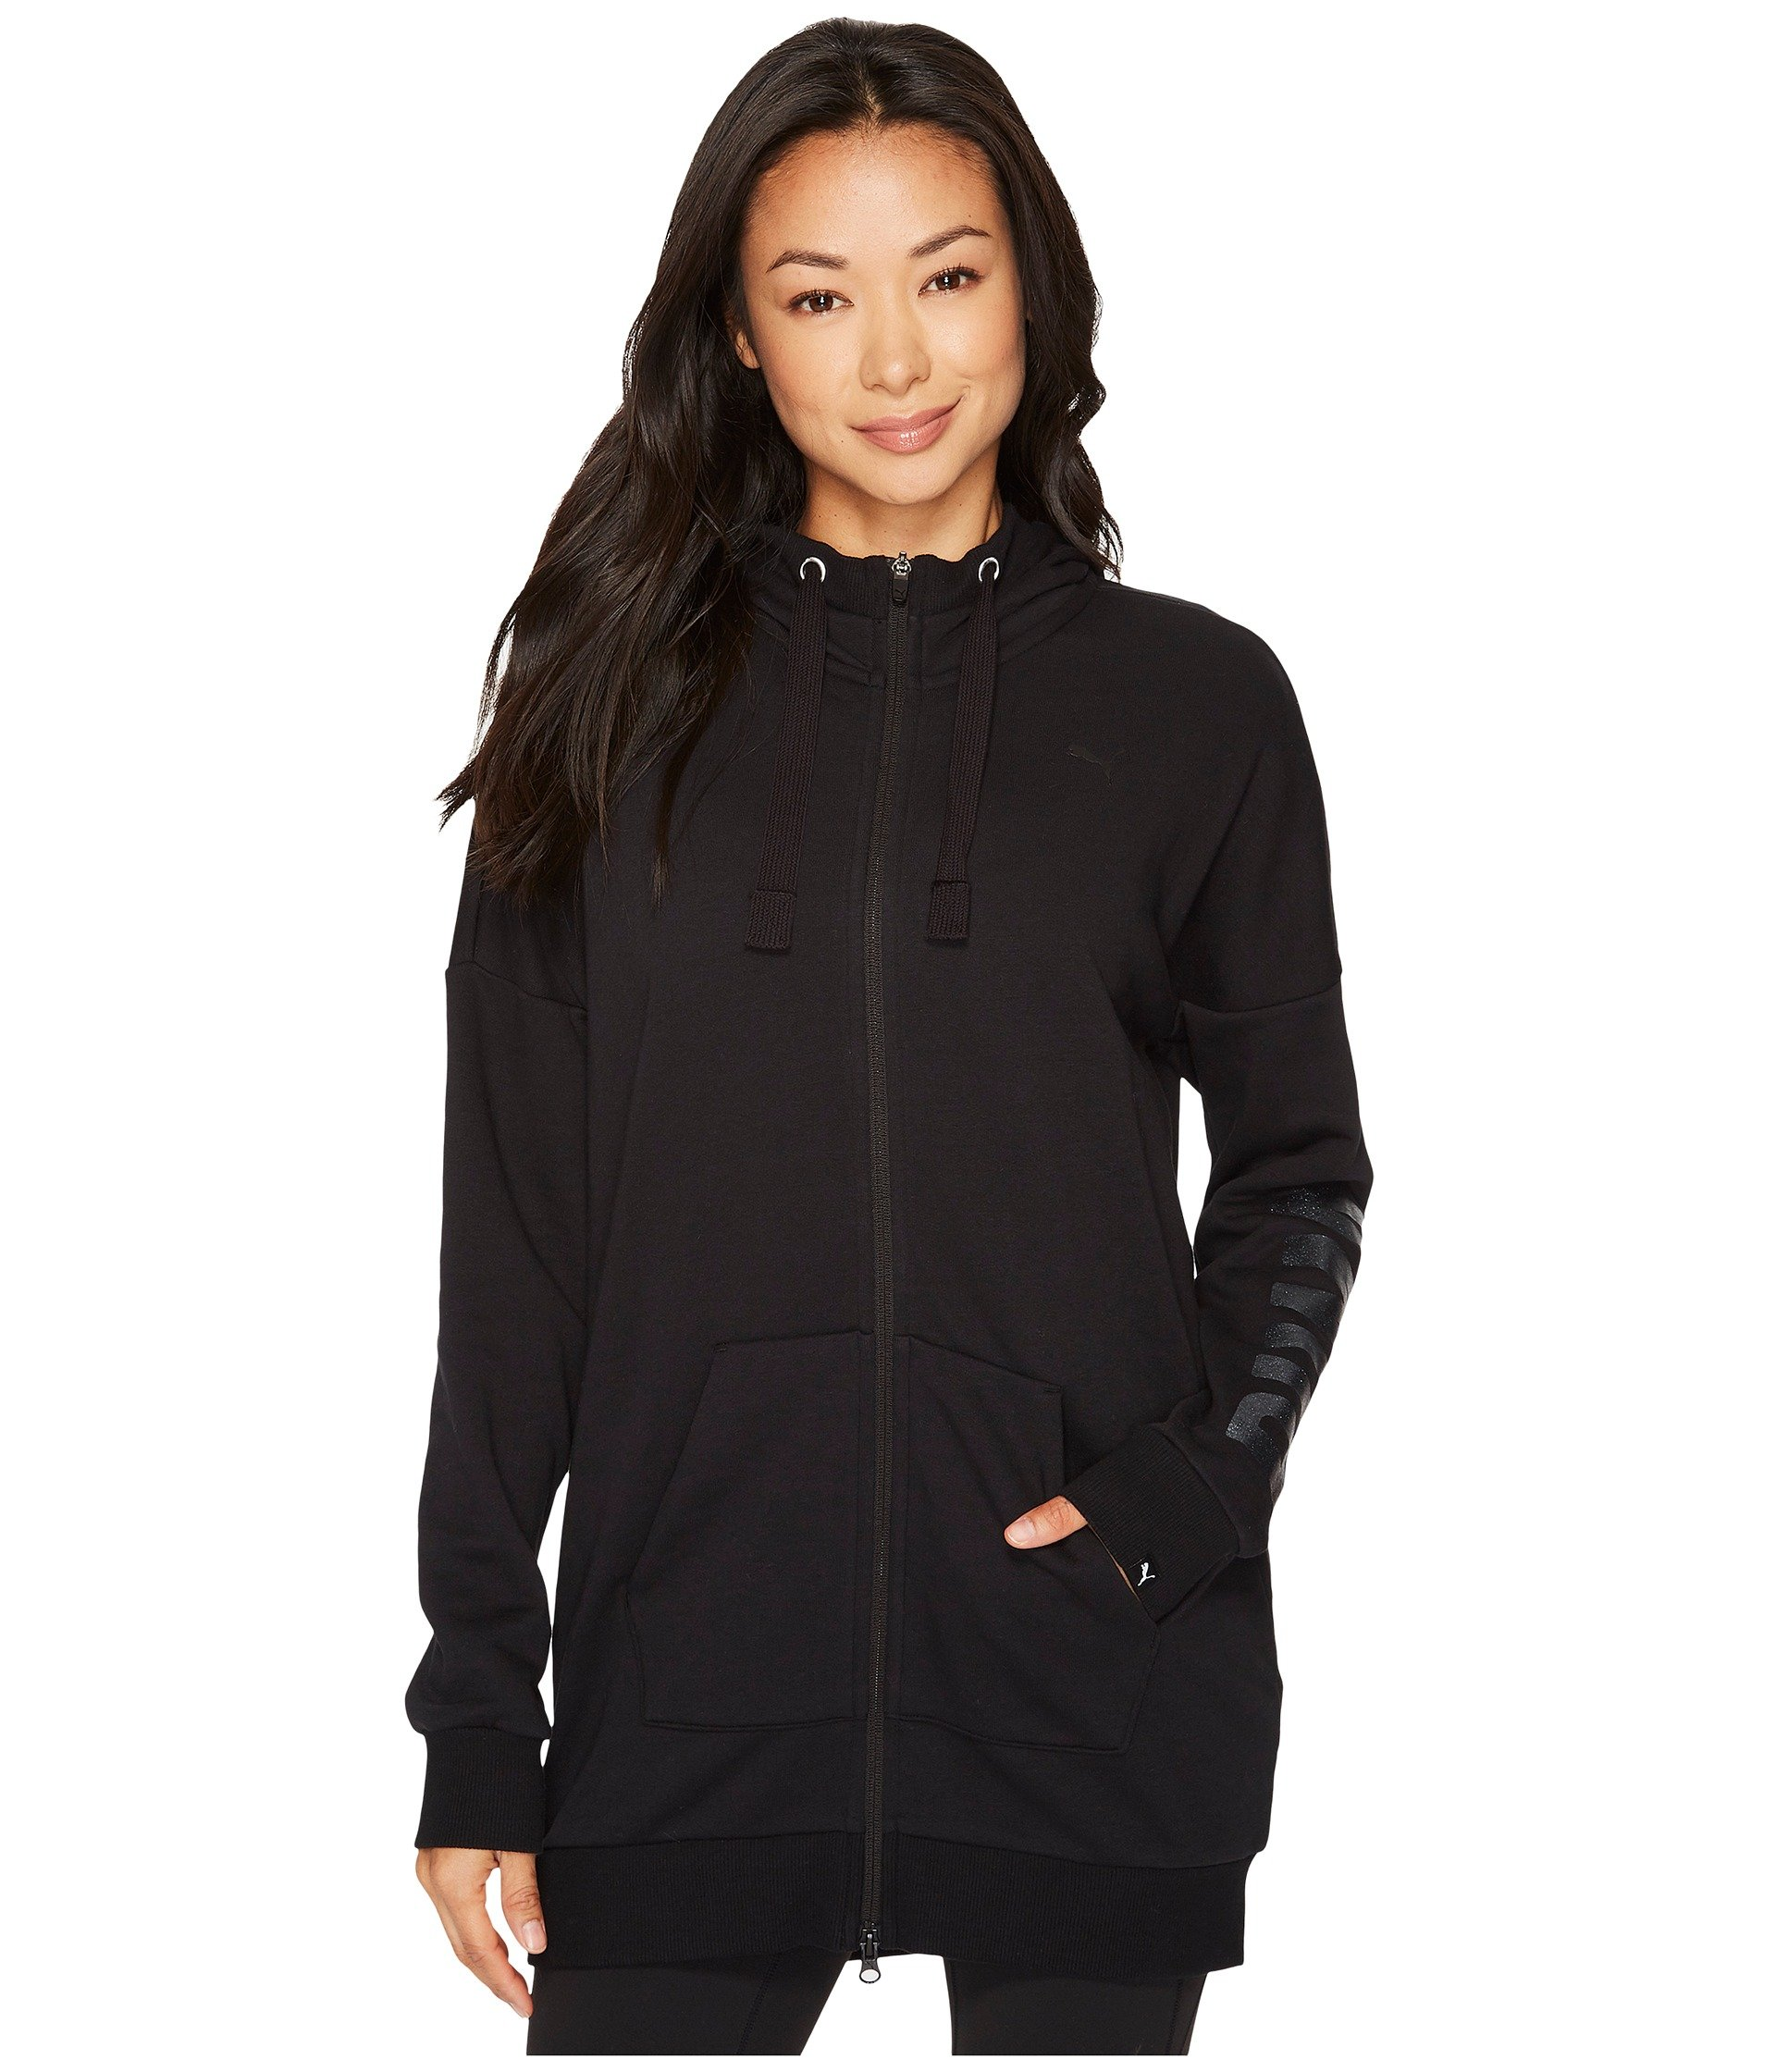 PUMA Women's Fusion Elongated Full Zip Hoodie Cotton Black/Glitter X-Small